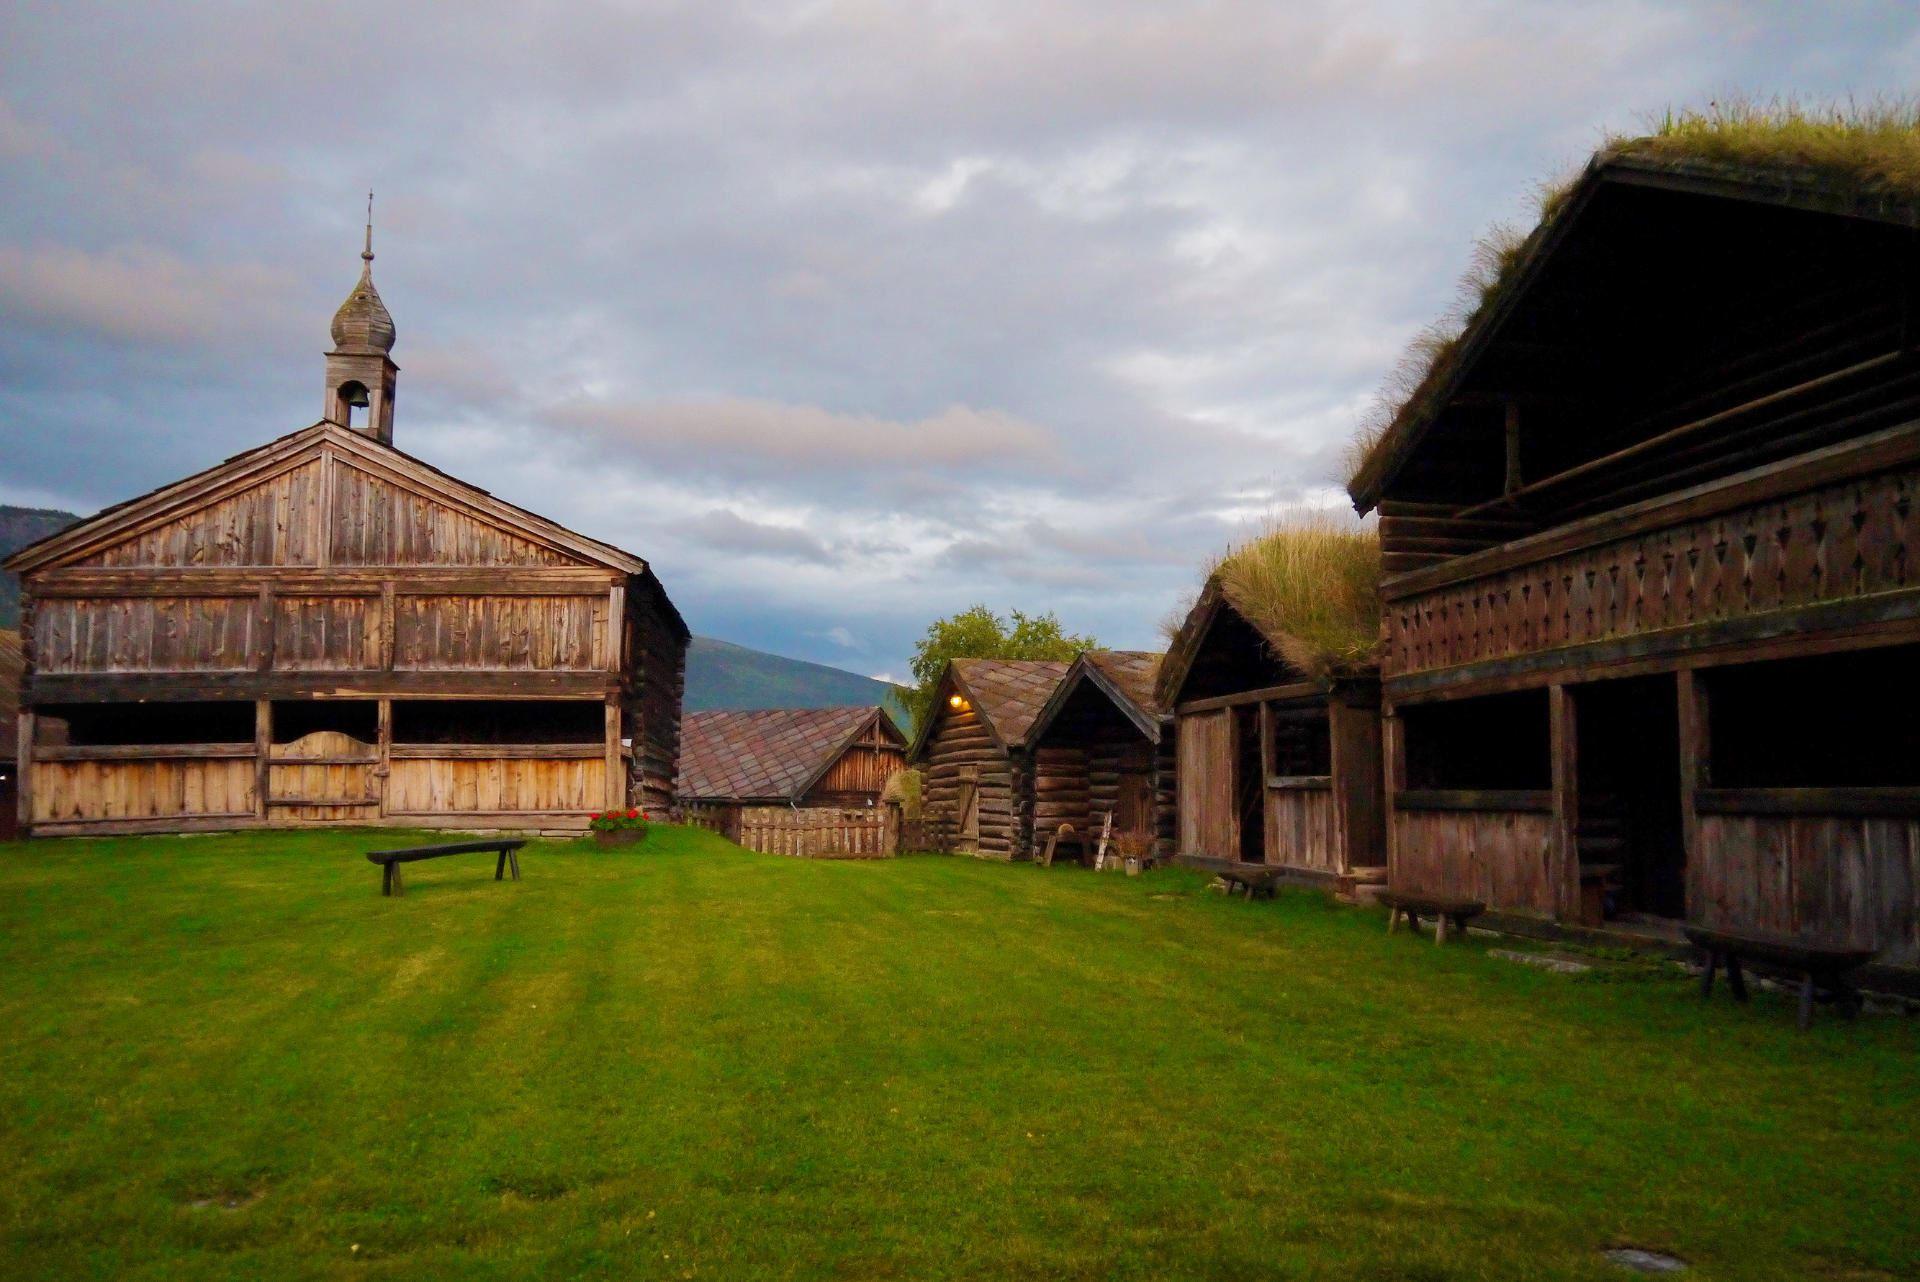 Erland Husom, Øygarden